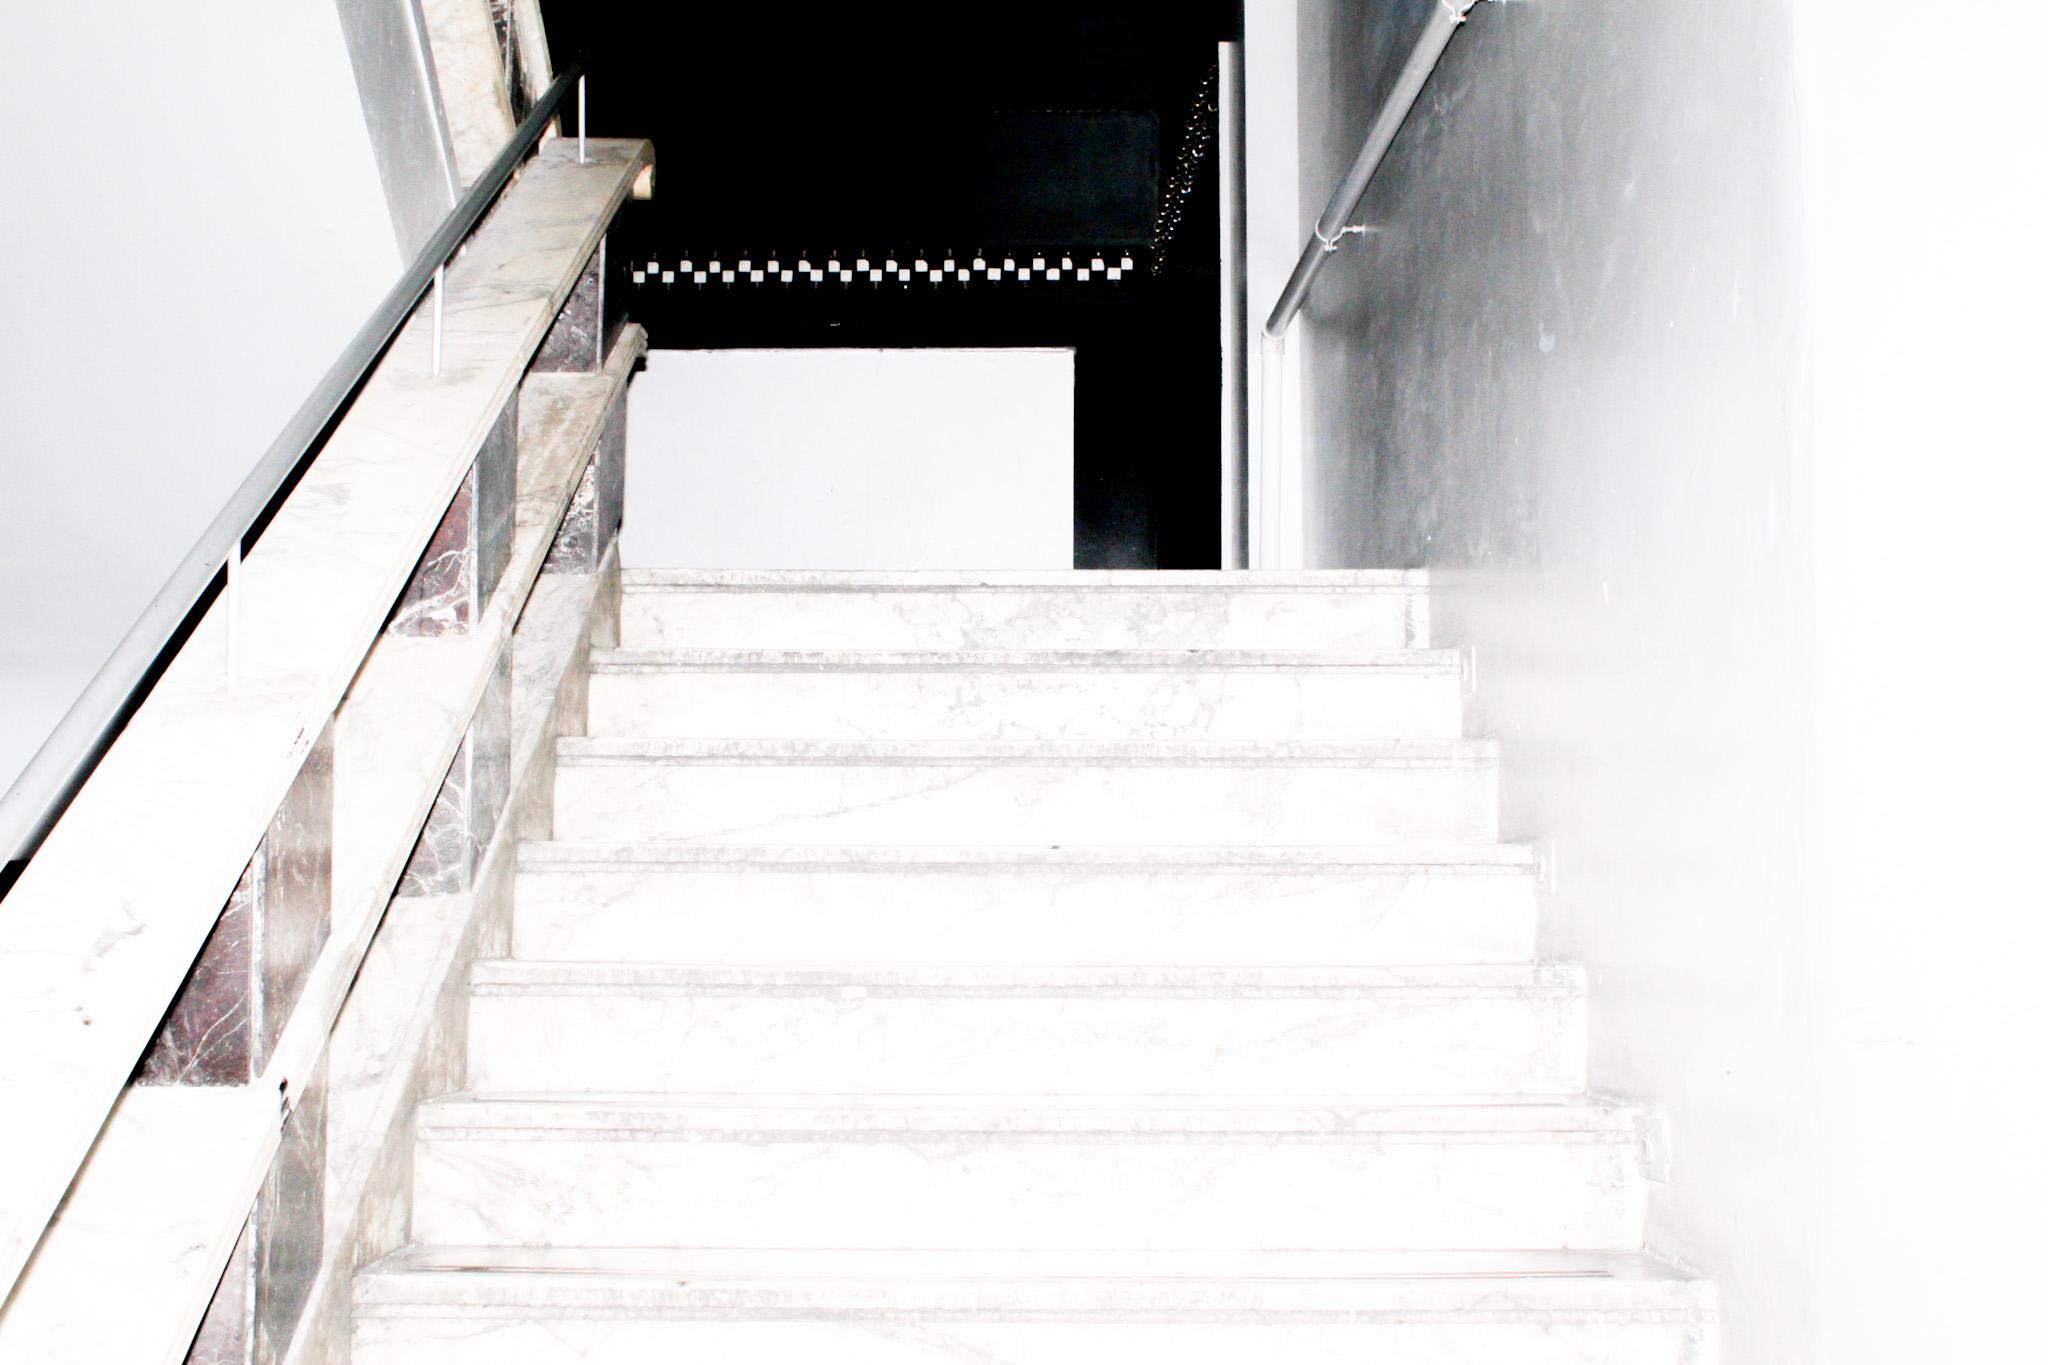 limelight-milano-diary-rfm-1.jpg